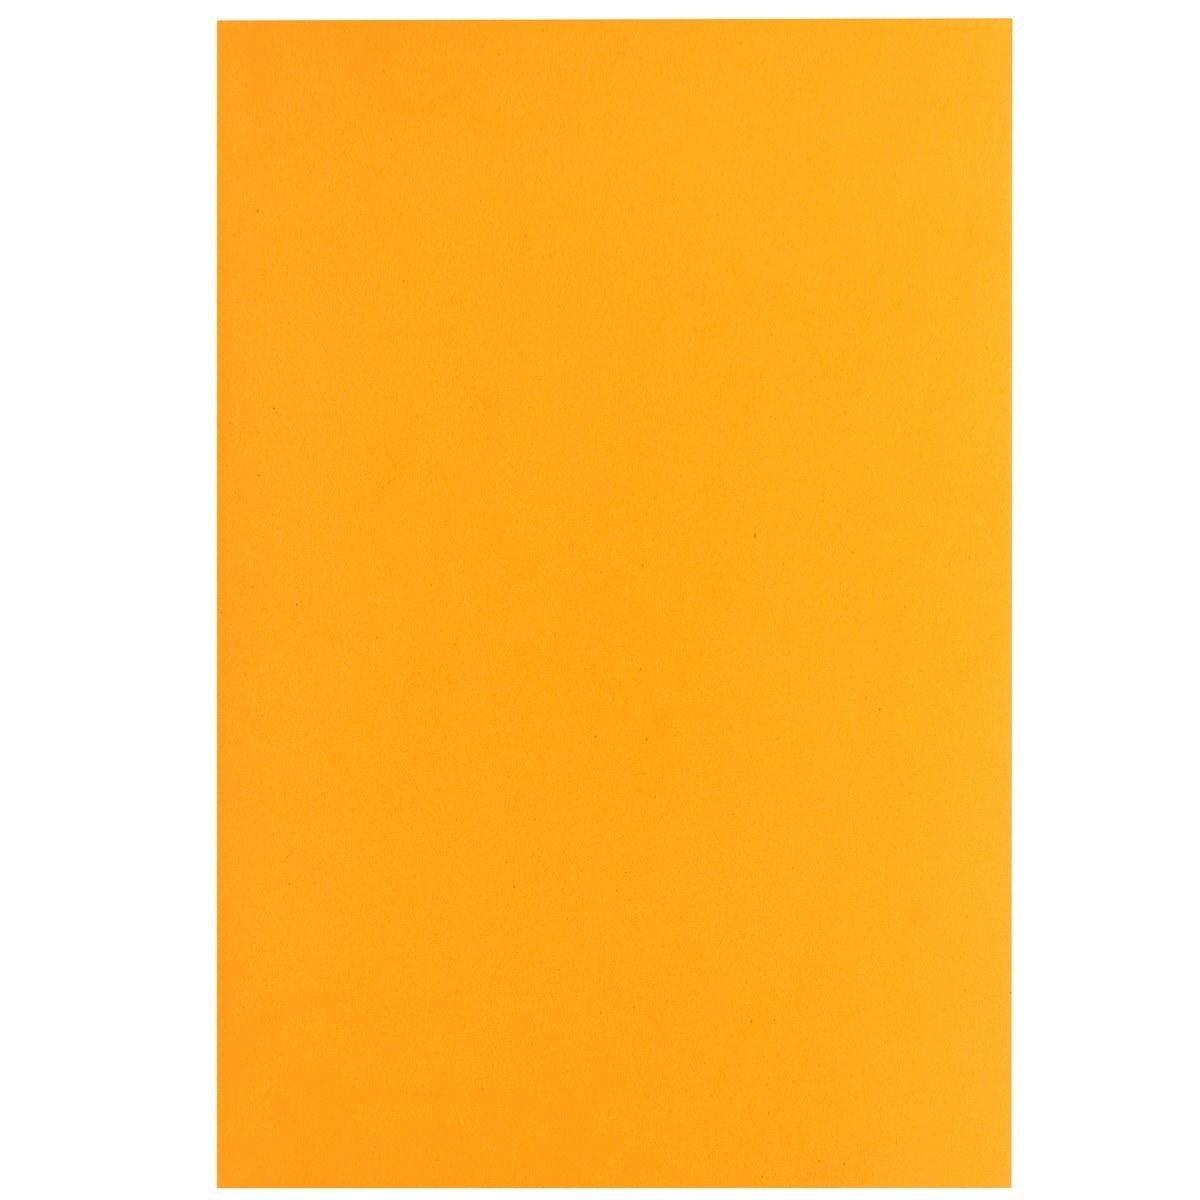 Foam Sheets A4 Size Without Sticker 3MM Orange